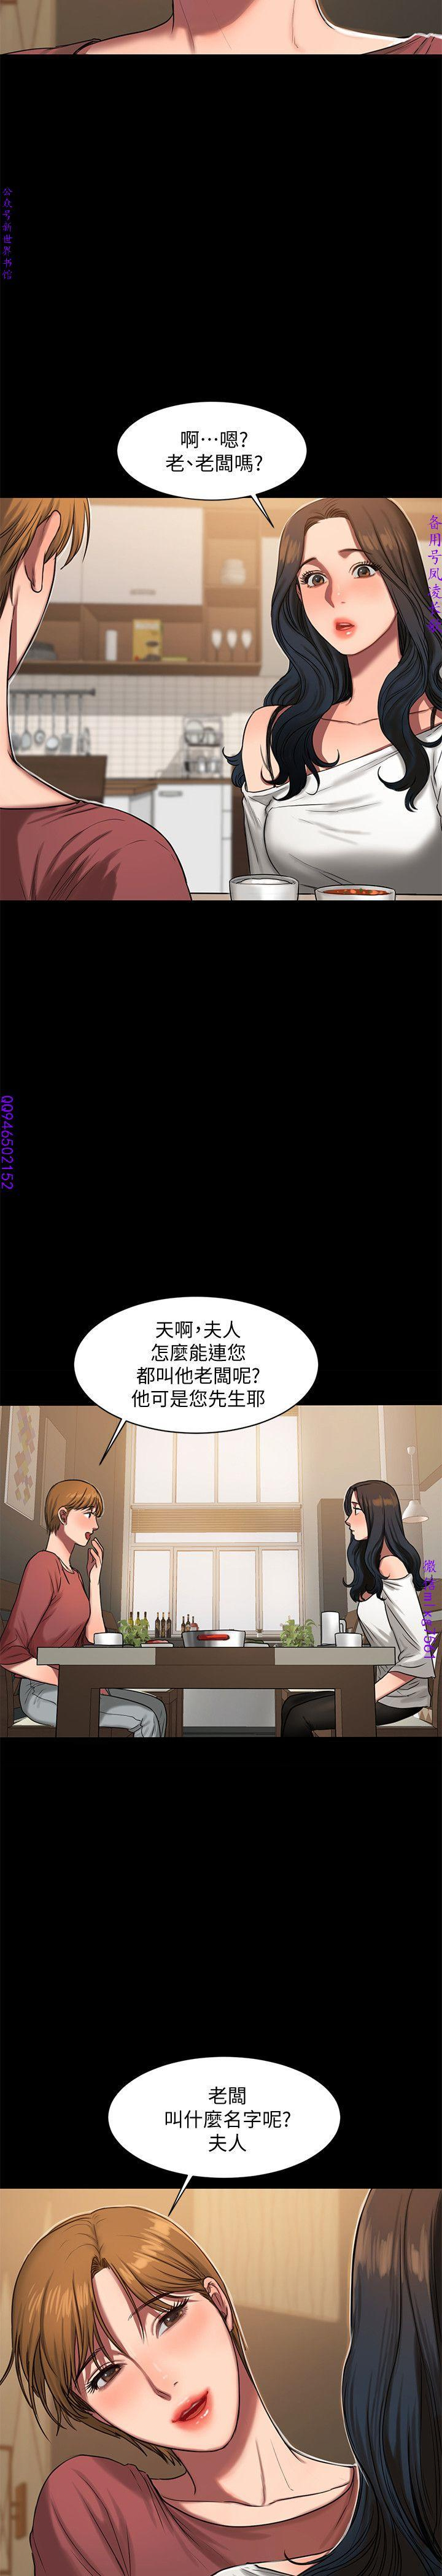 Run away 1-10【中文】 206